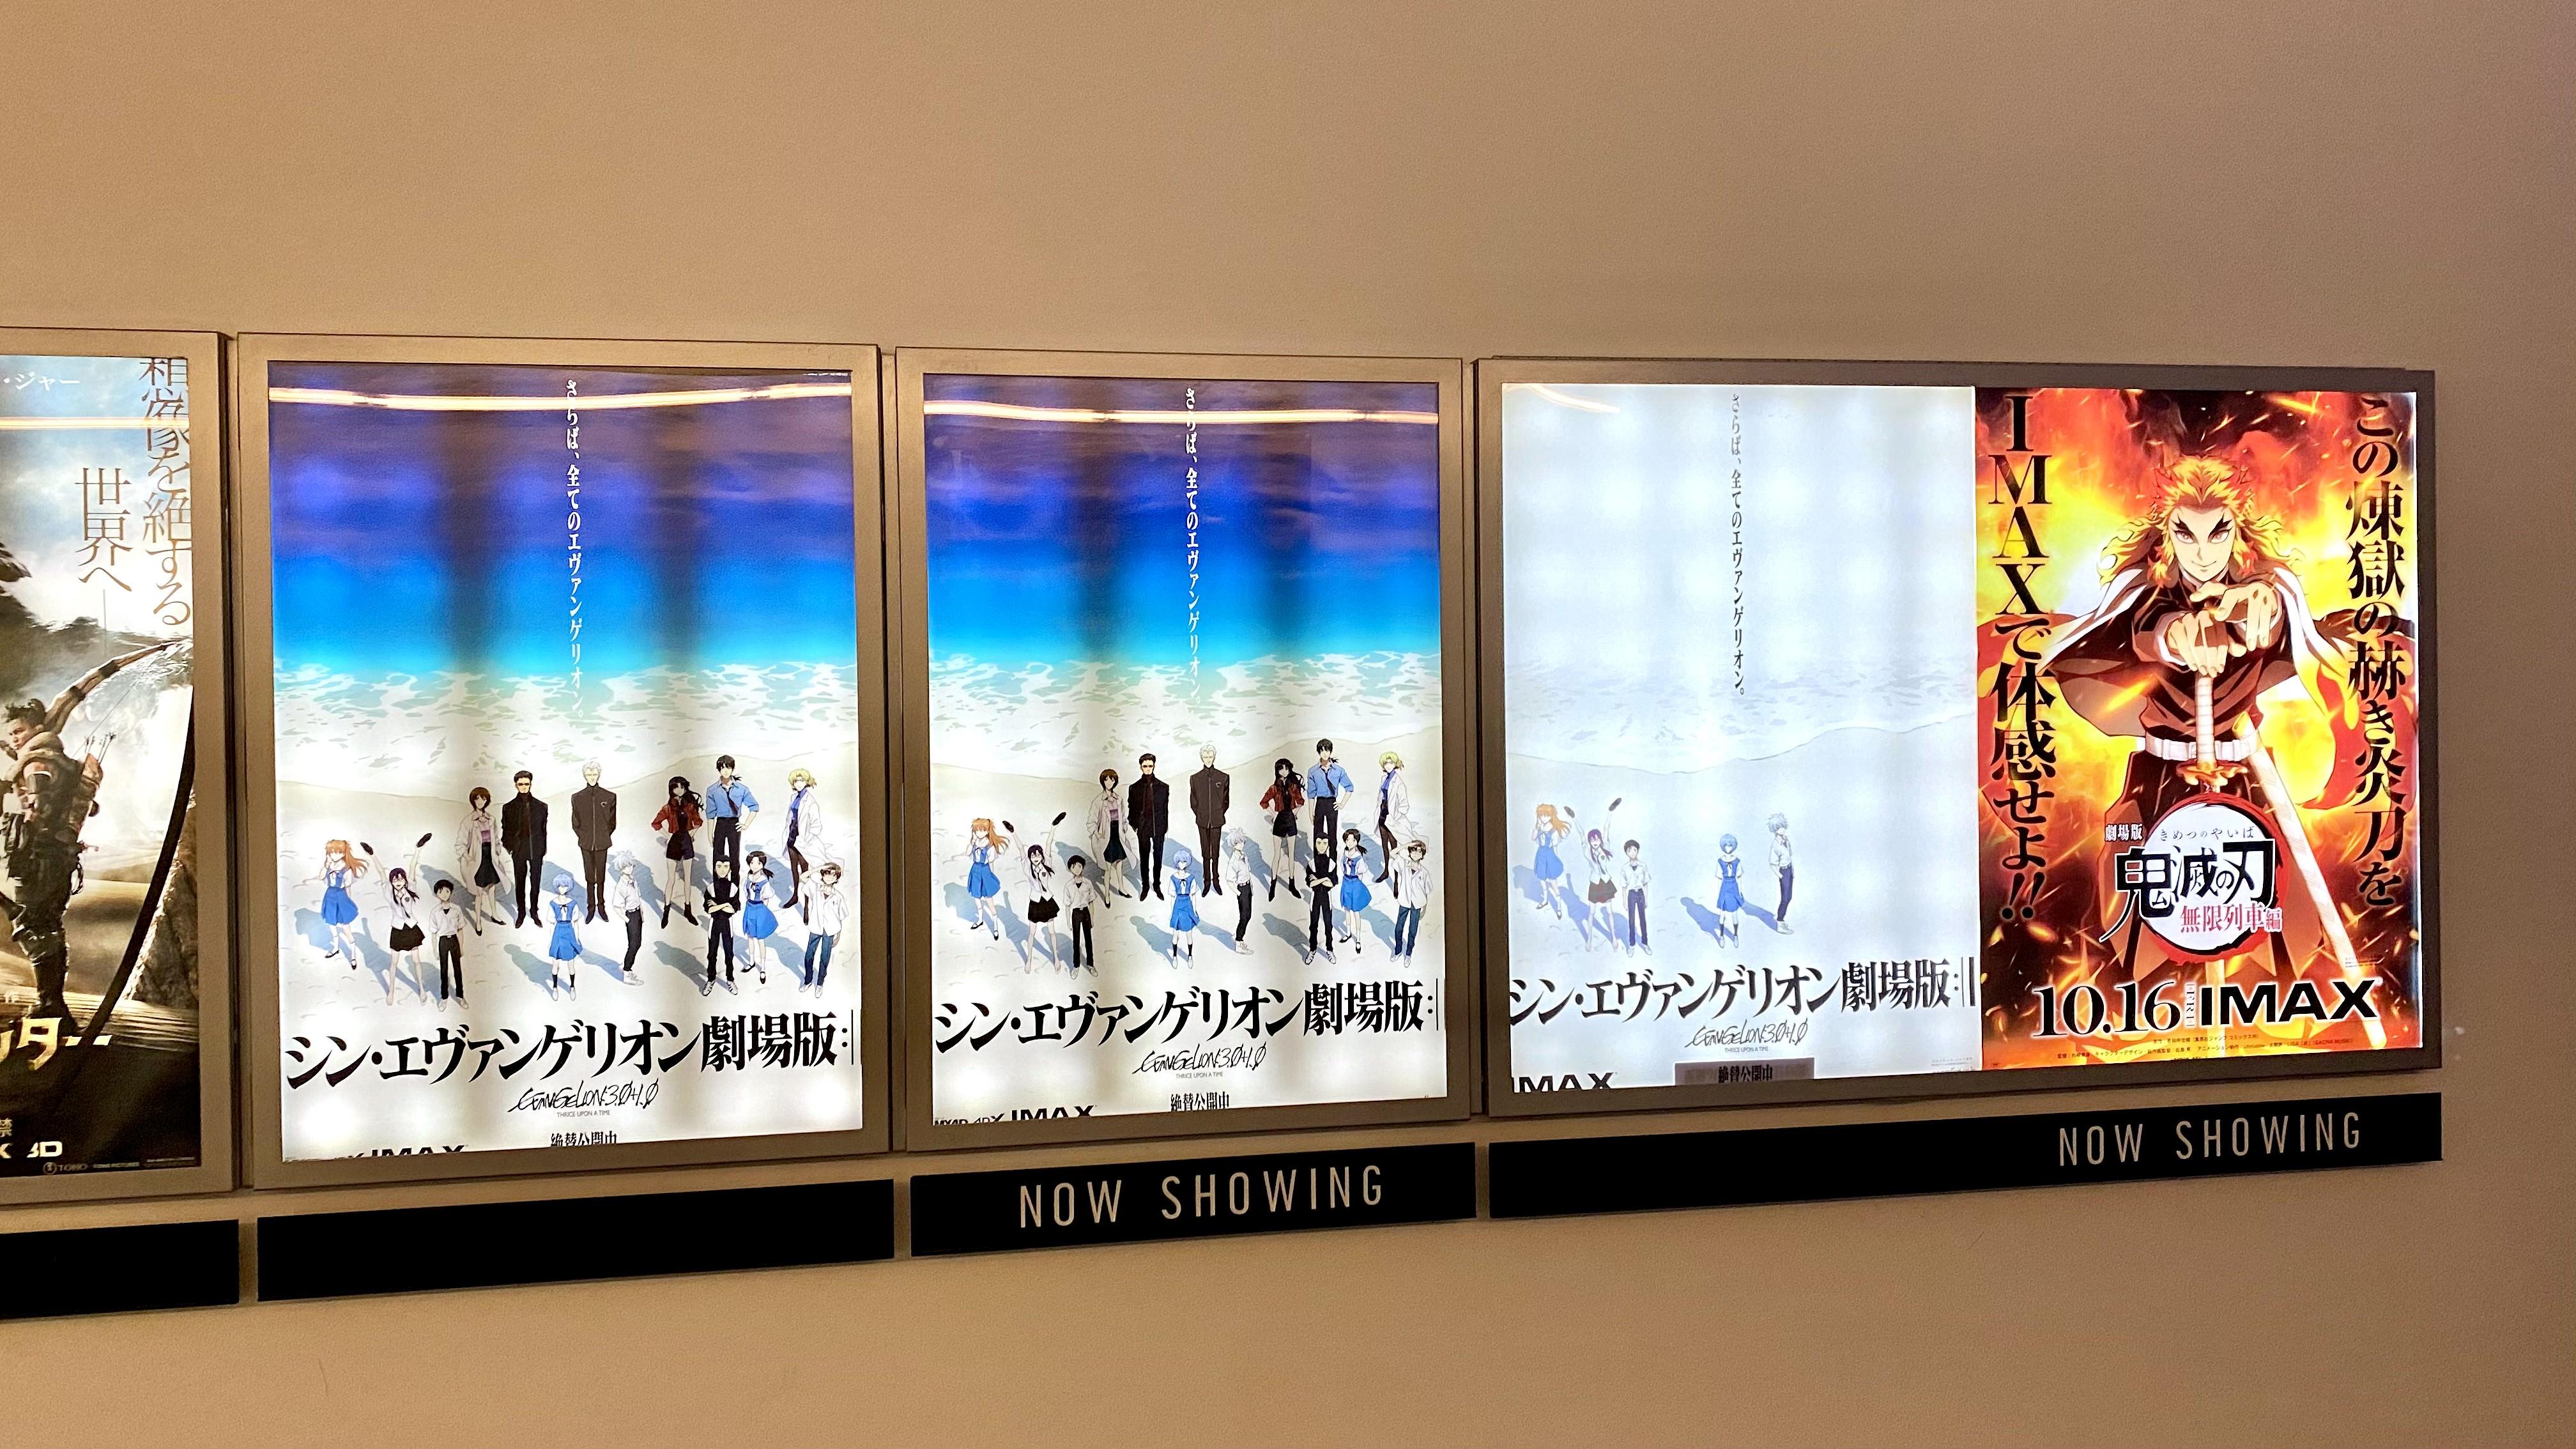 Evangelion 3.0+1.0 posters next to Demon Slayer